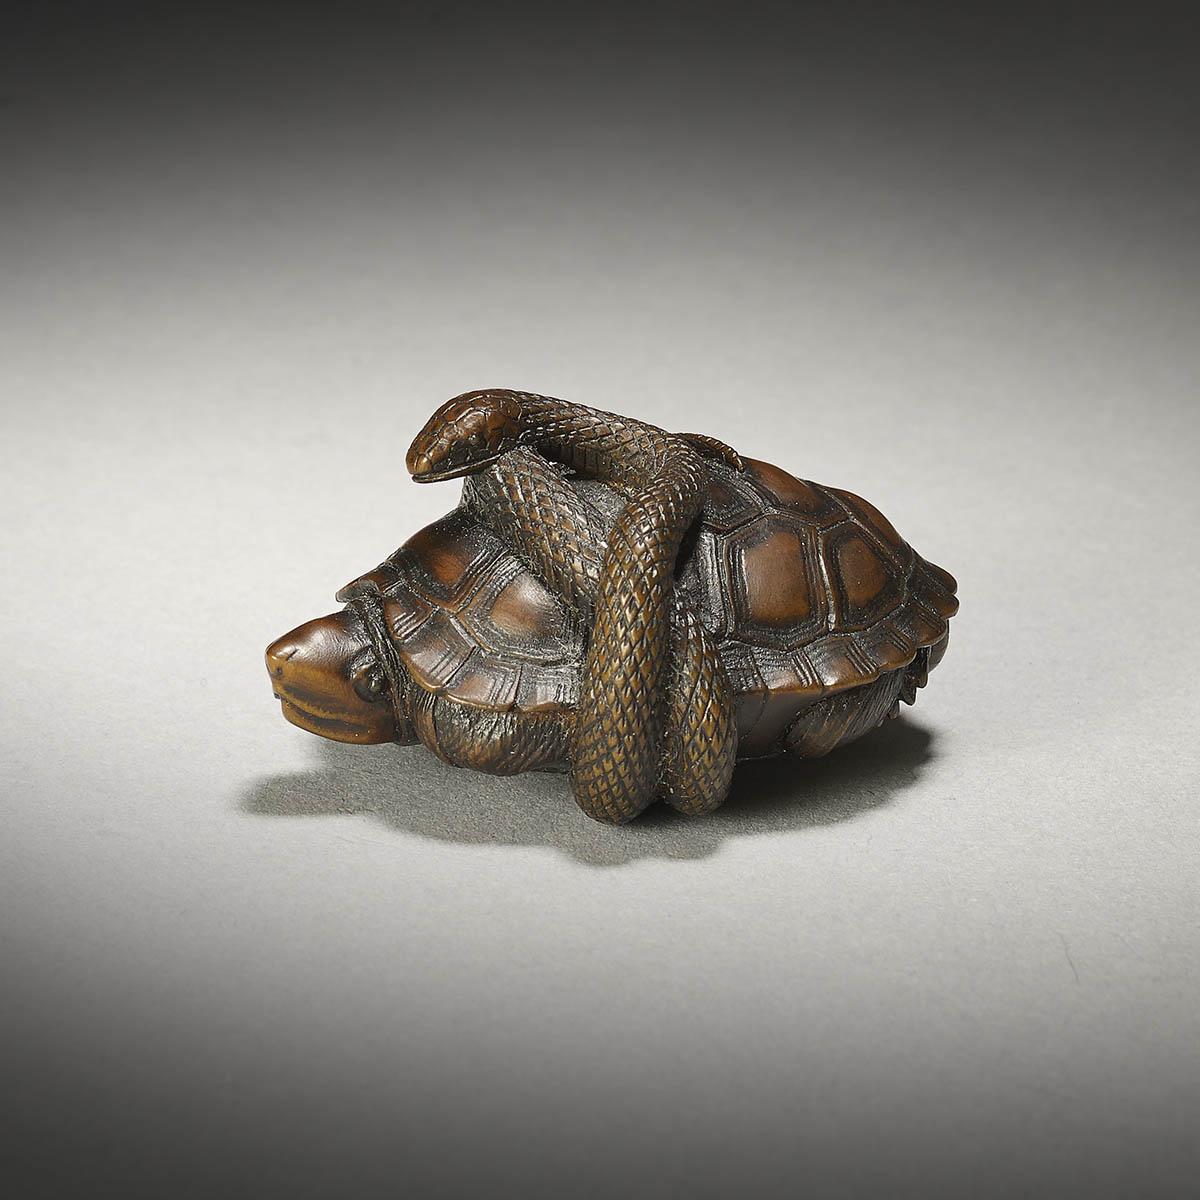 Masatami (Shomin), wood netsuke of a snake and turtle